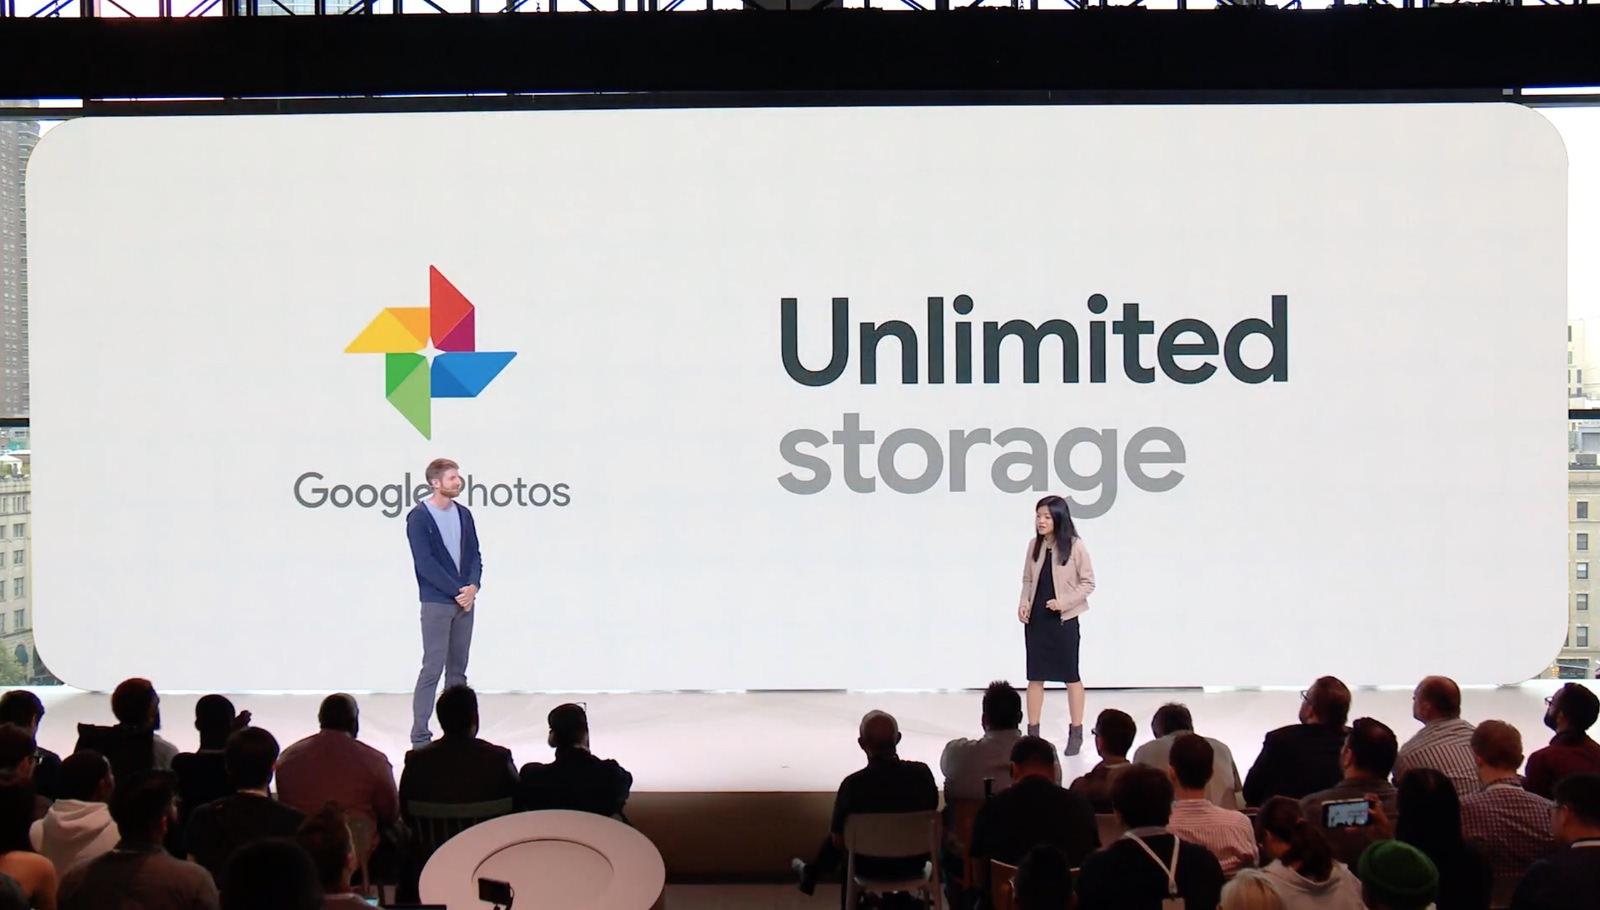 Google-Pixel-3-Camera-Features-13.jpg